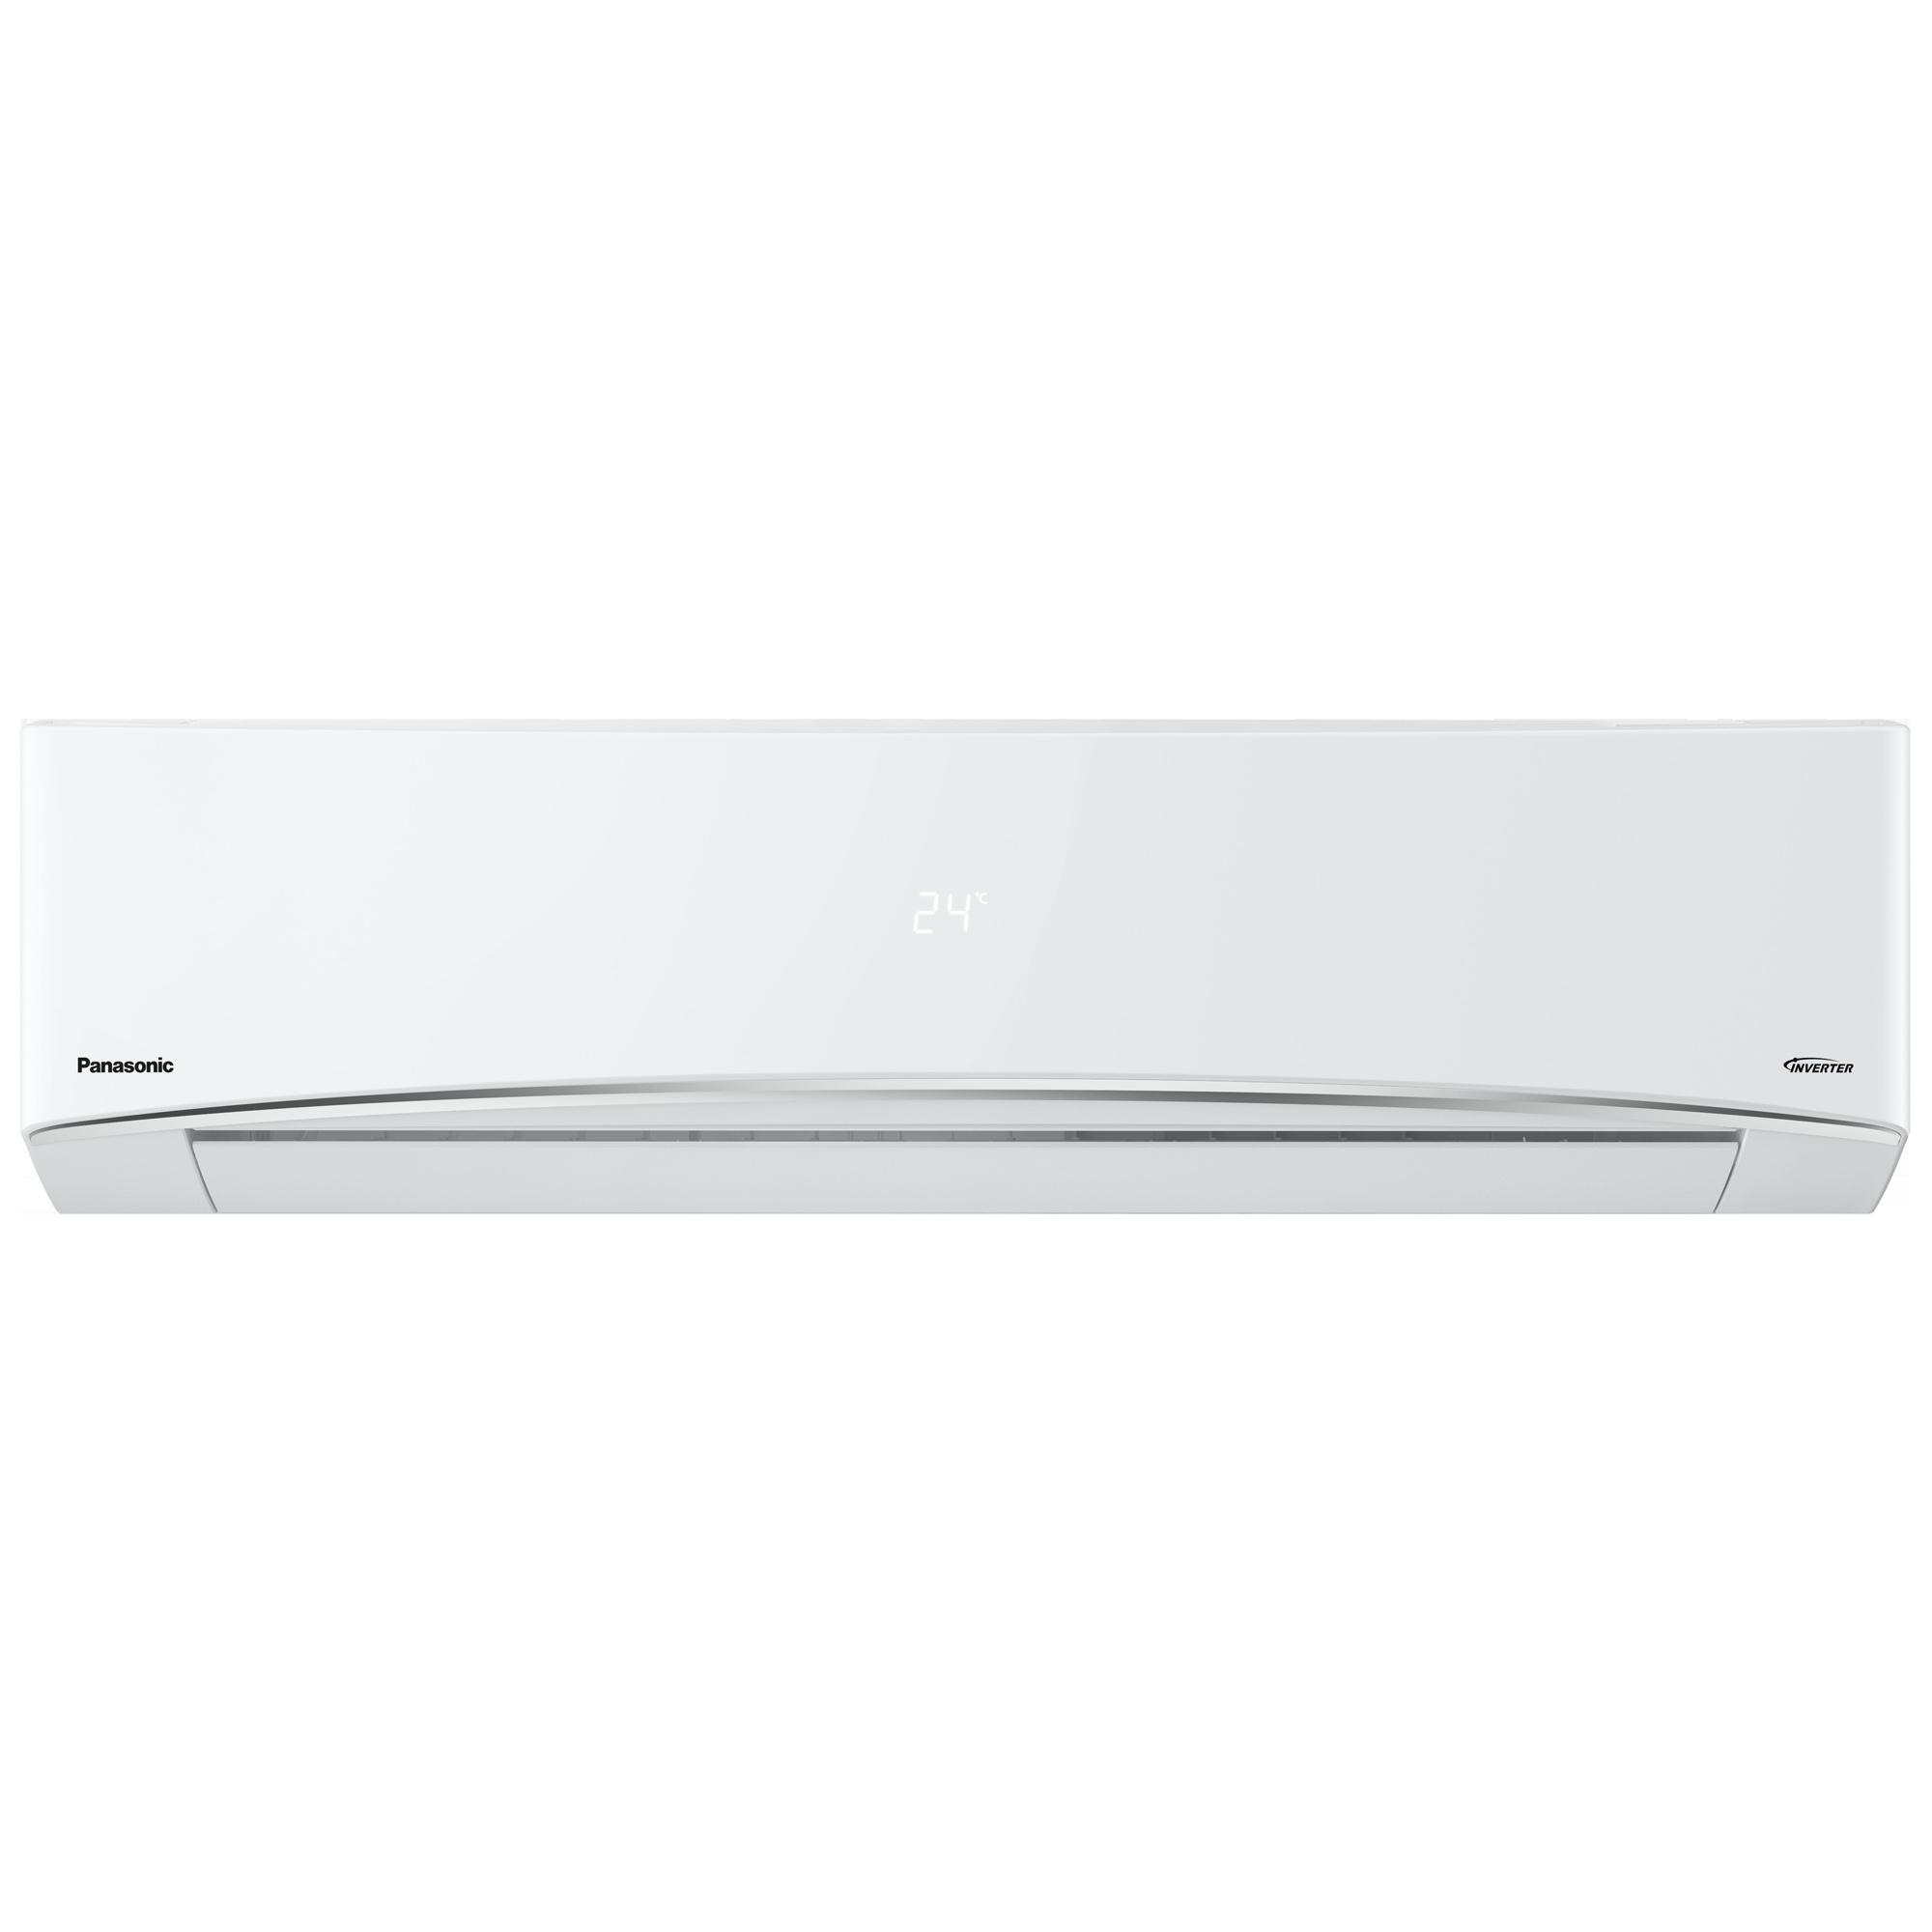 Panasonic KU 1.5 Ton 4 Star Inverter Split AC (Air Purification Filter, Wi-Fi, Copper Condenser, CS/CU-KU18XKYXF, White)_1